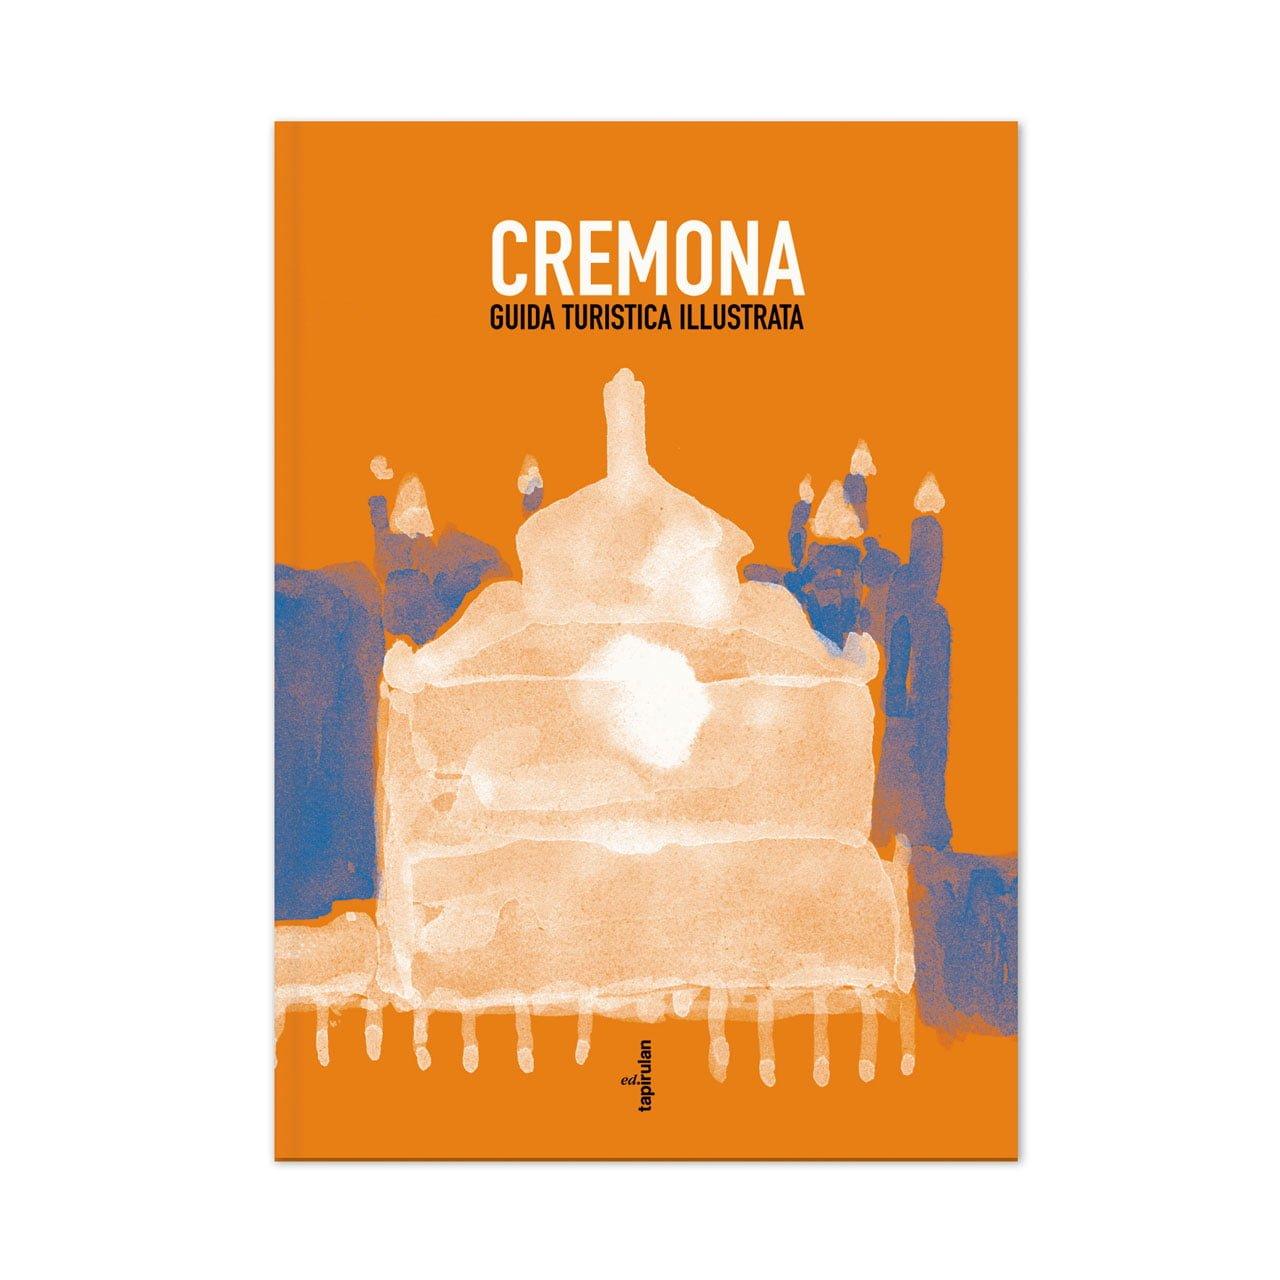 Cremona - Guida turistica illustrata